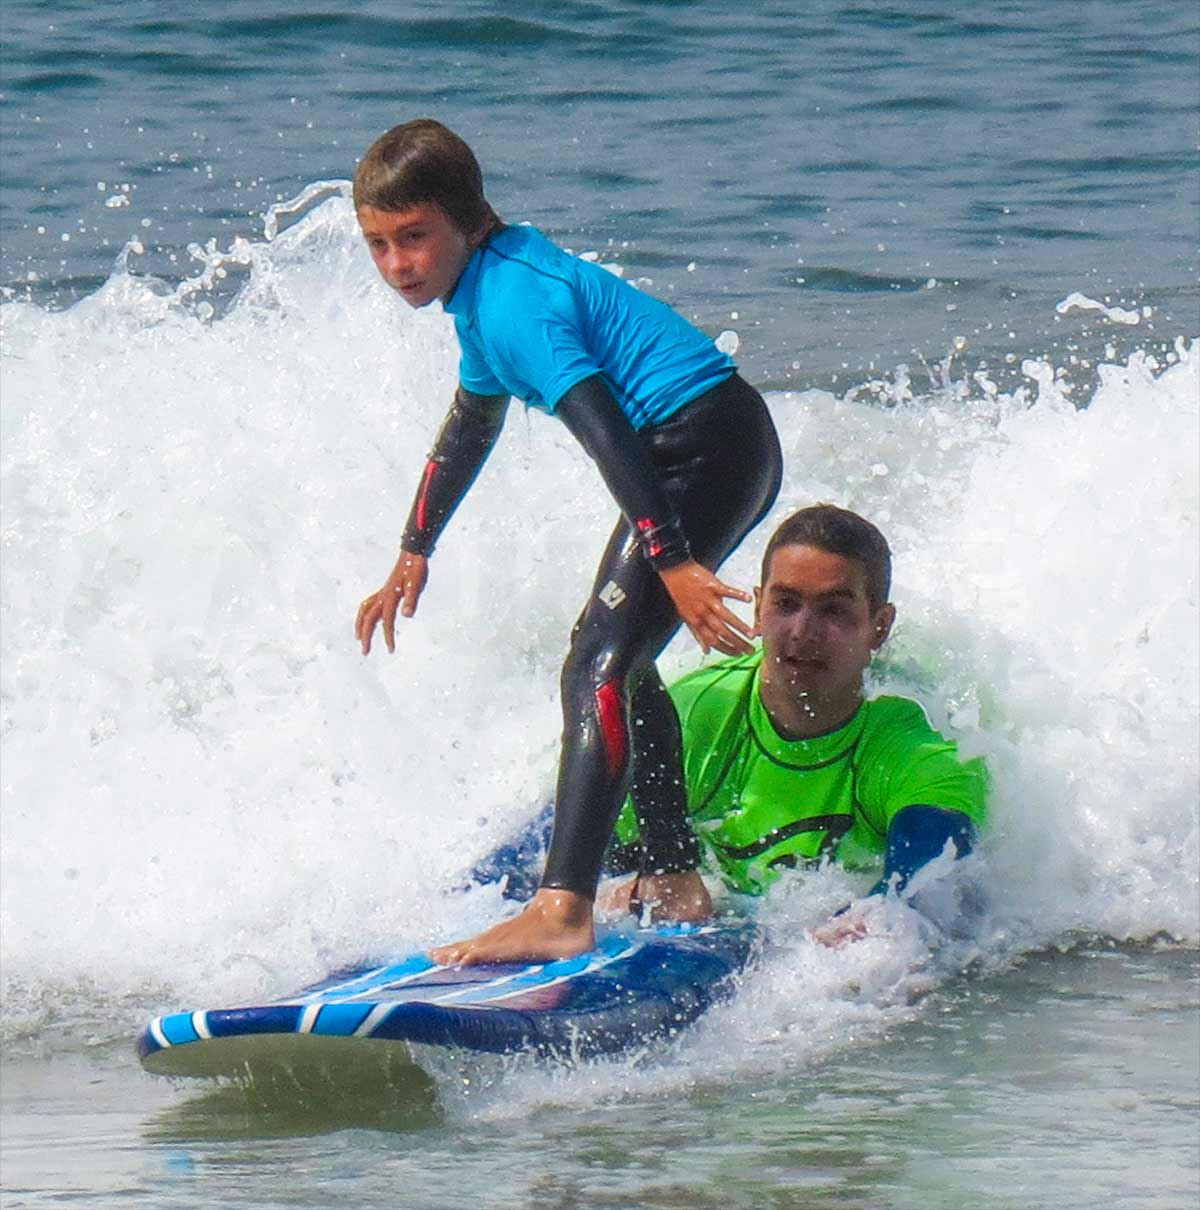 surfing-with-aqua-surf-school.jpg